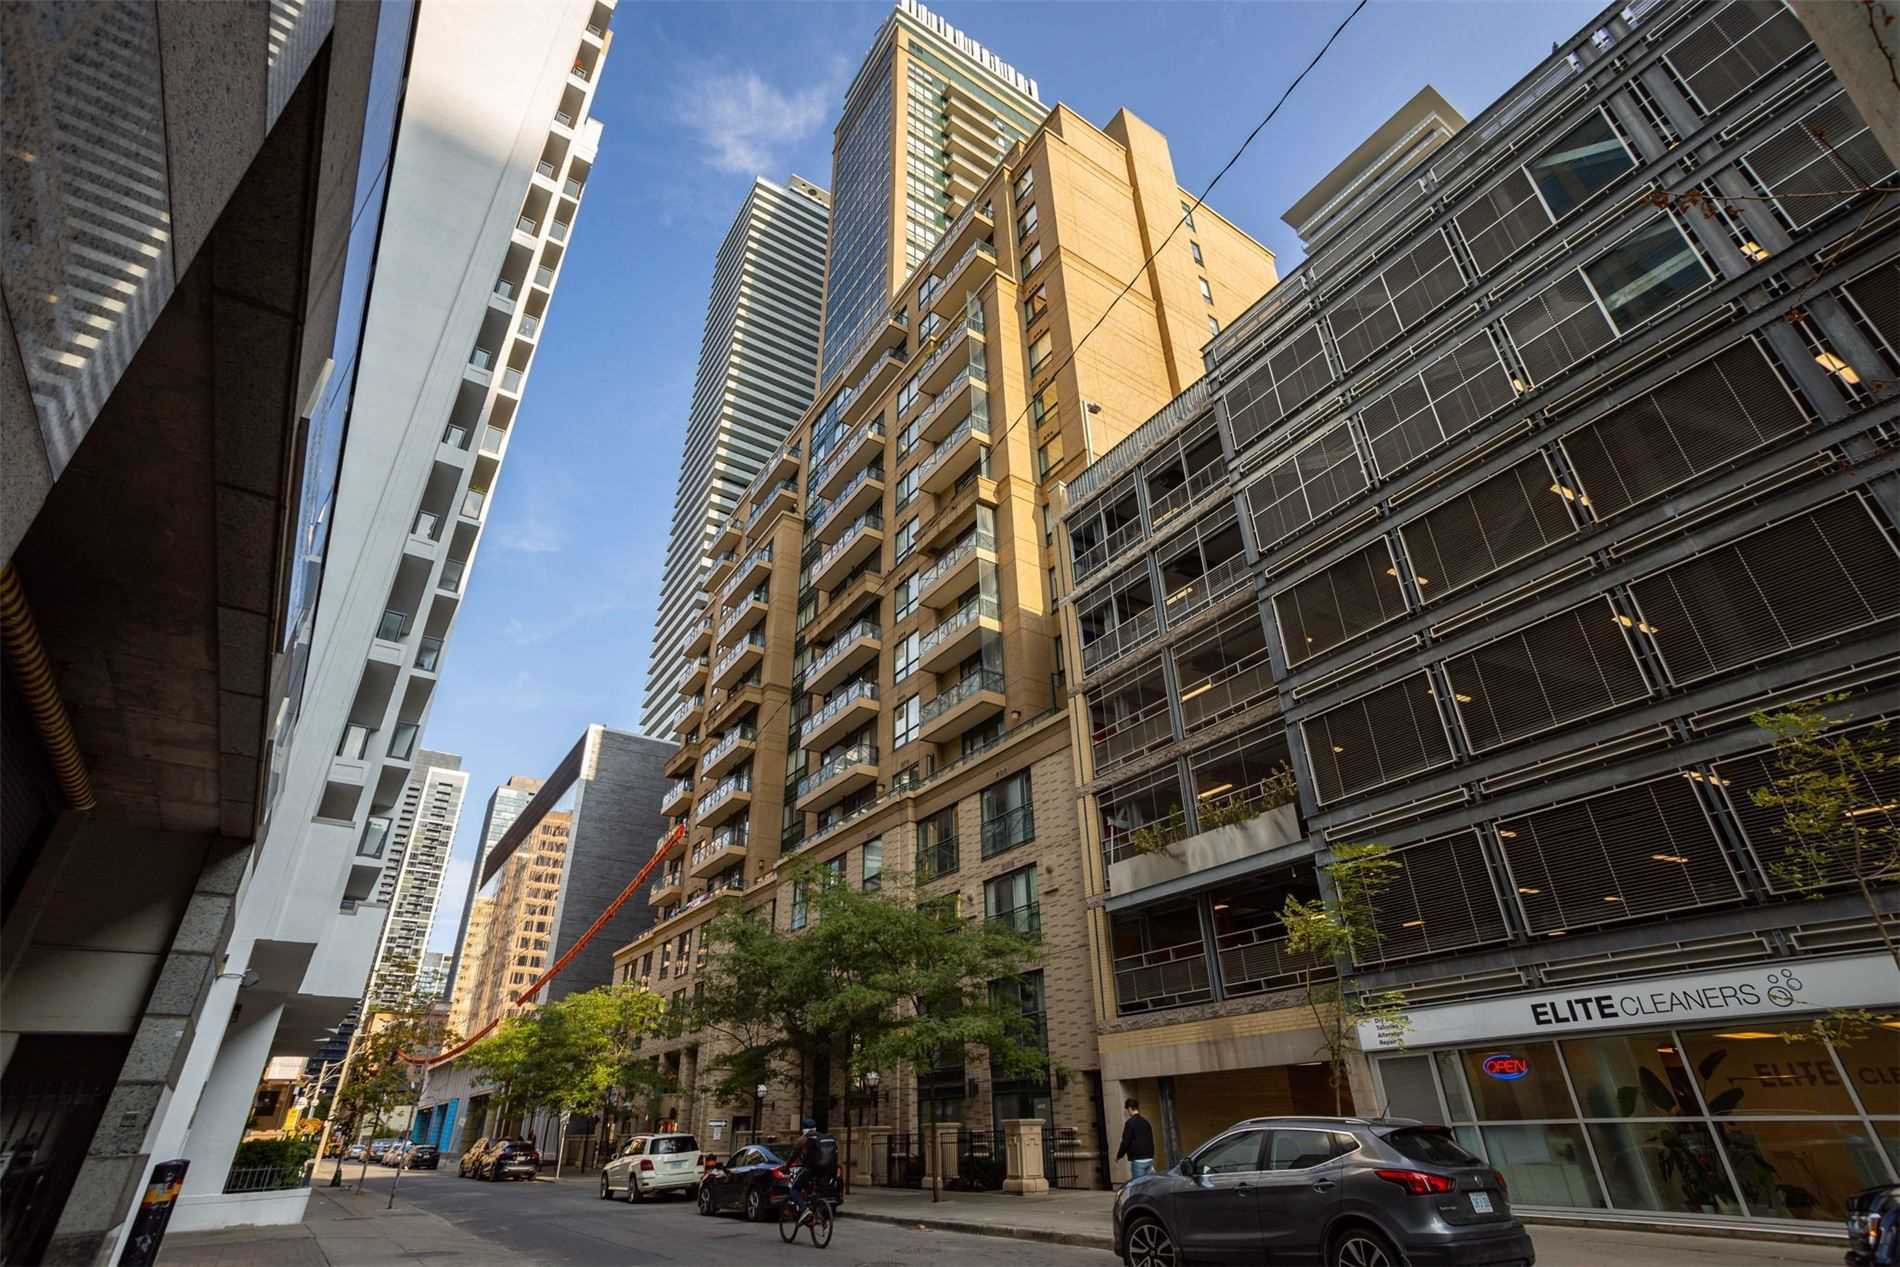 Main Photo: 208 35 Hayden Street in Toronto: Church-Yonge Corridor Condo for sale (Toronto C08)  : MLS®# C4915003